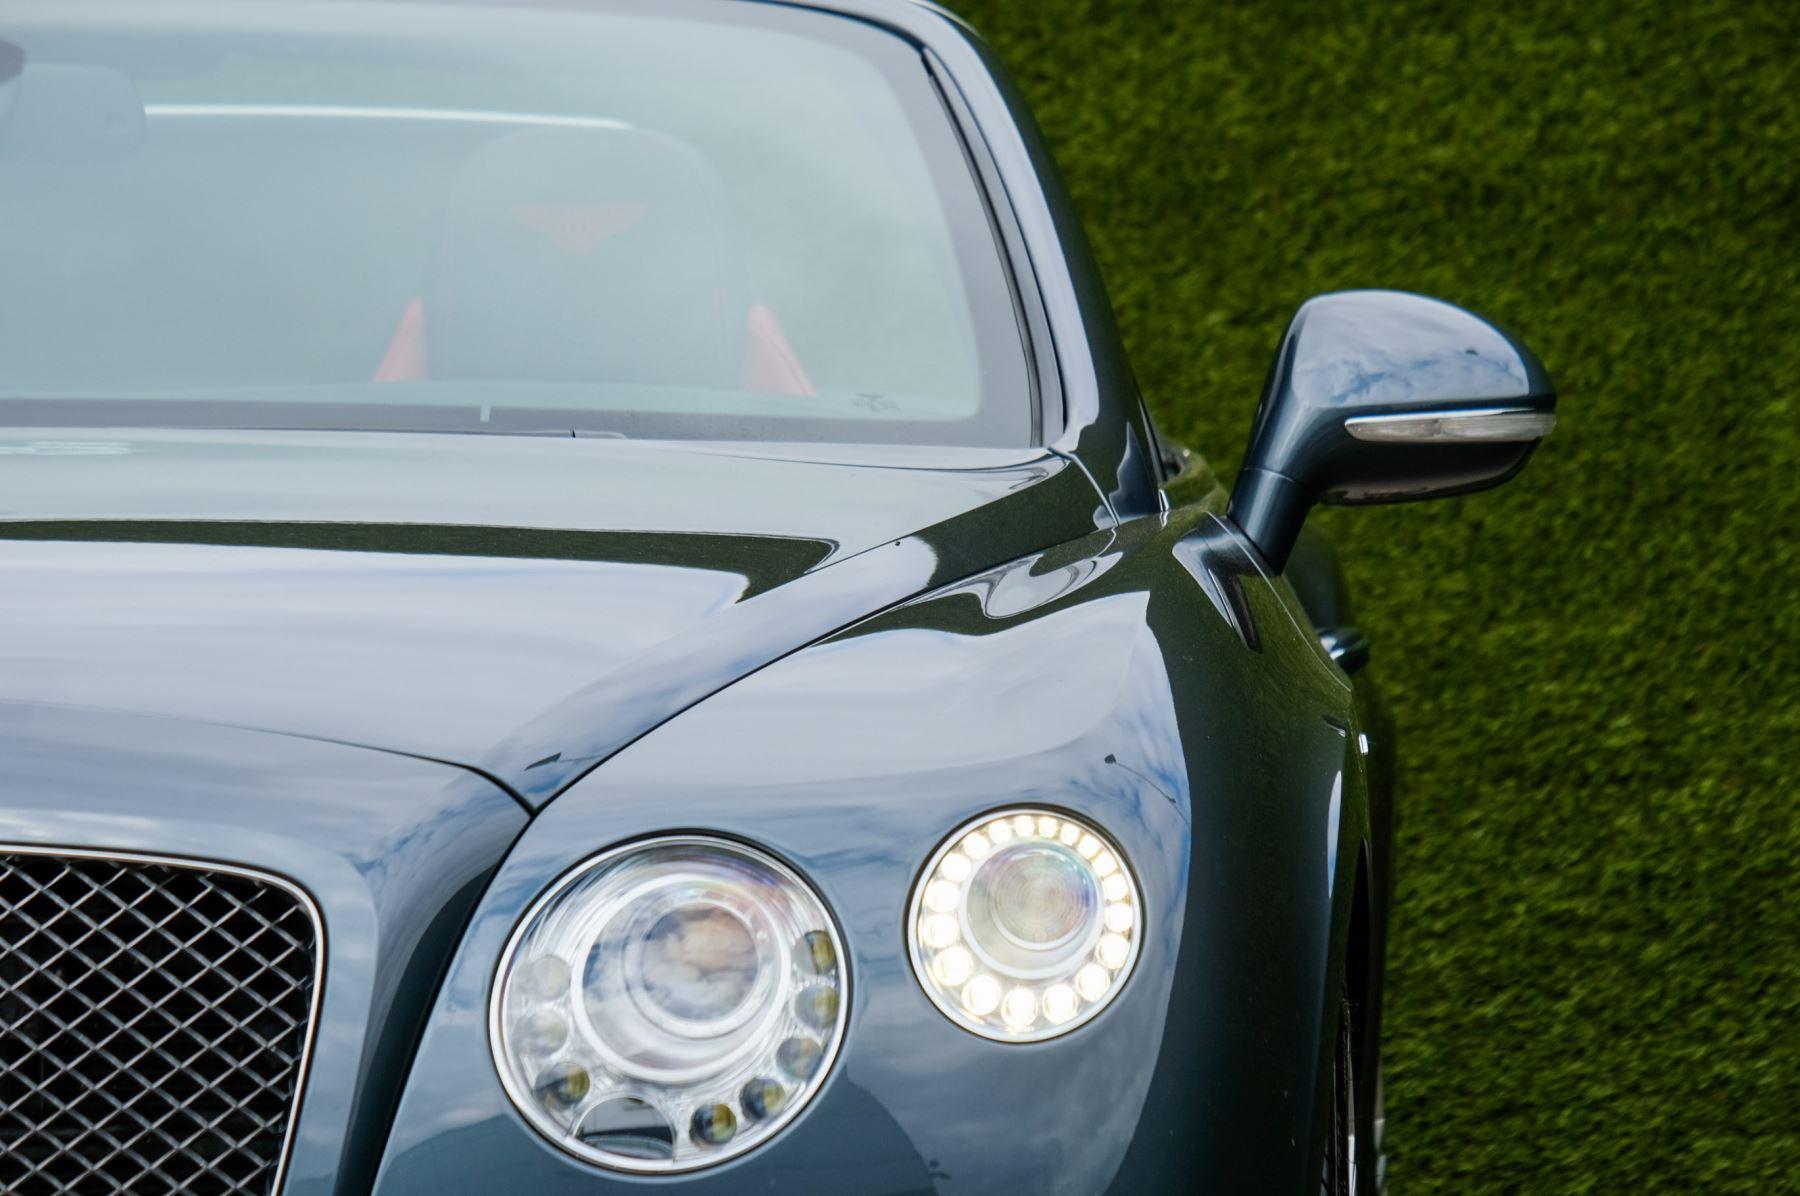 Bentley Continental GTC 6.0 W12 Speed - Massage Seats & Ventilation - Neck Warmer - Rear View Camera image 6